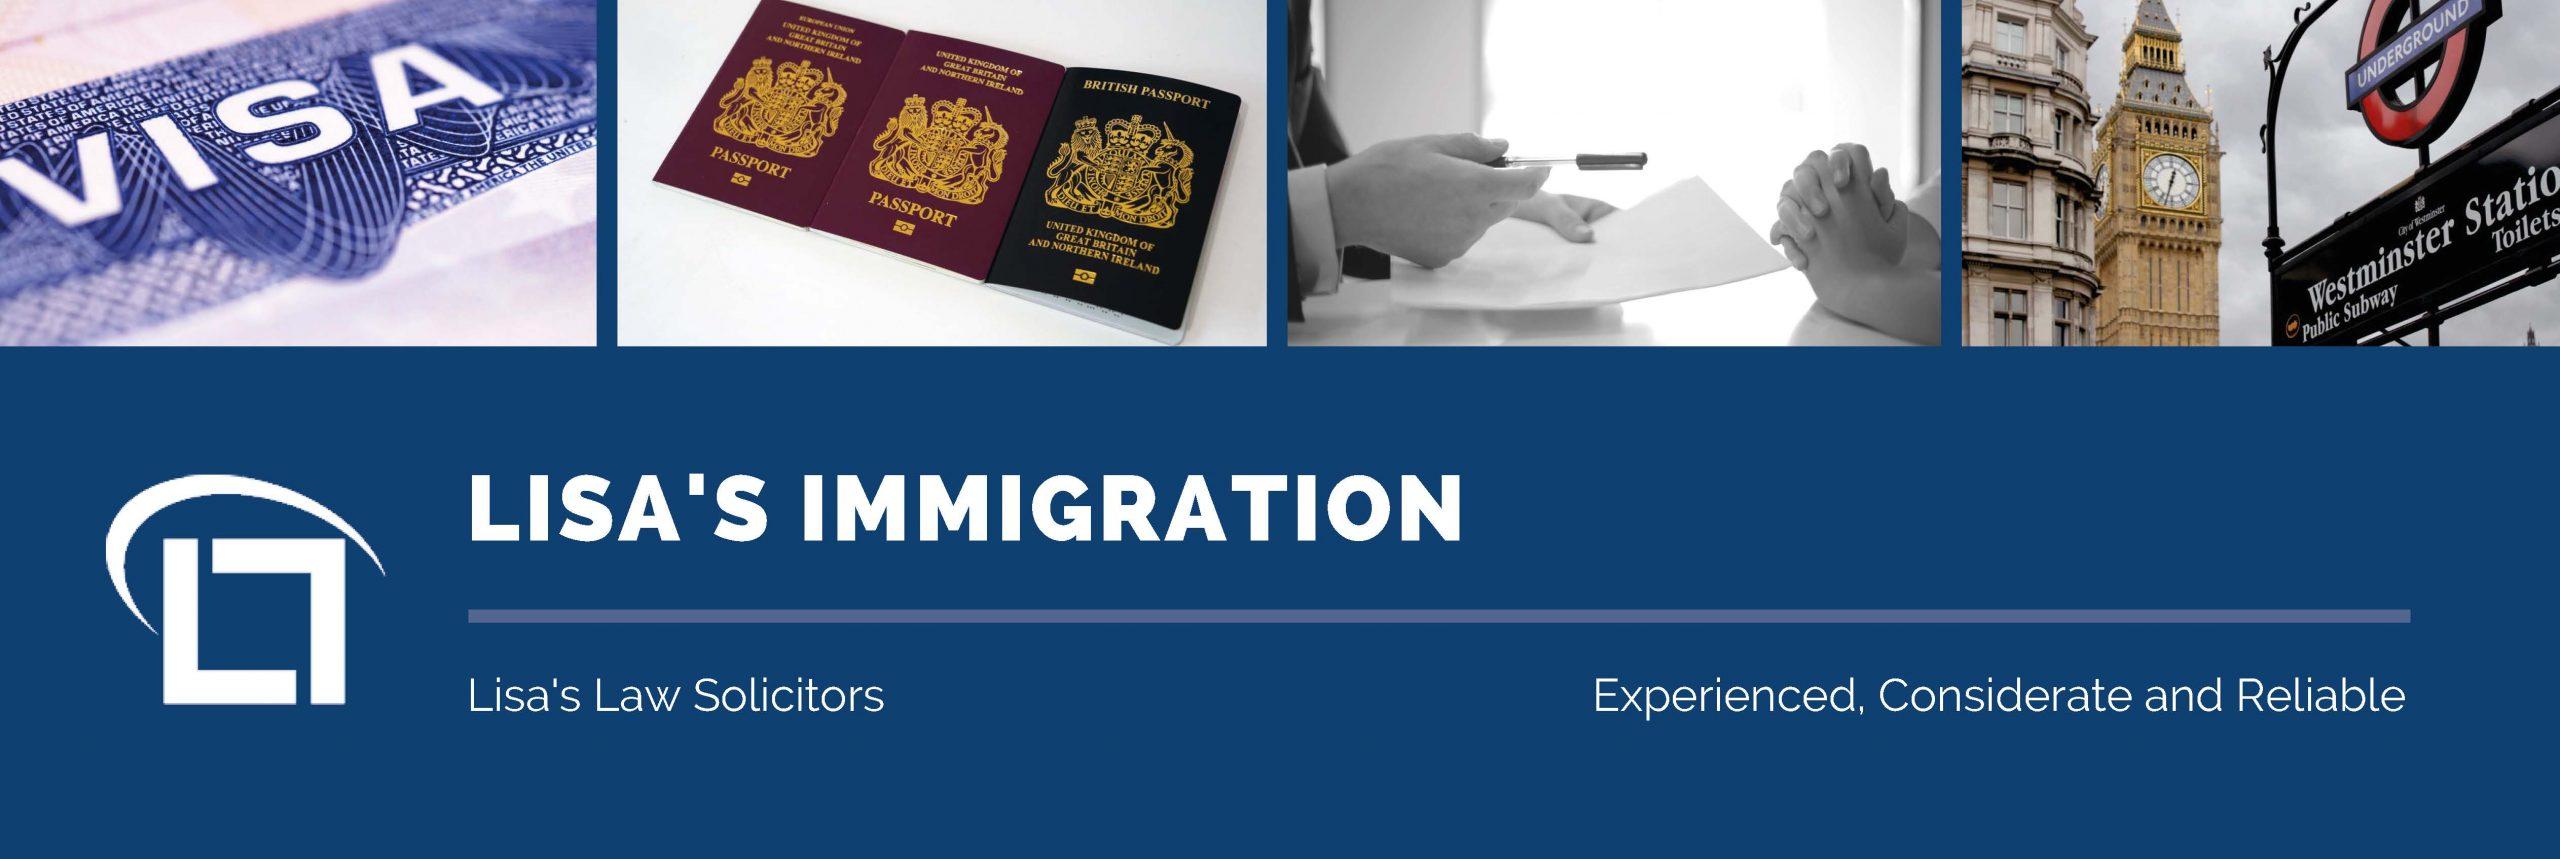 https://lisaslaw.co.uk/wp-content/uploads/2020/08/Lisas-Immigration-scaled.jpg